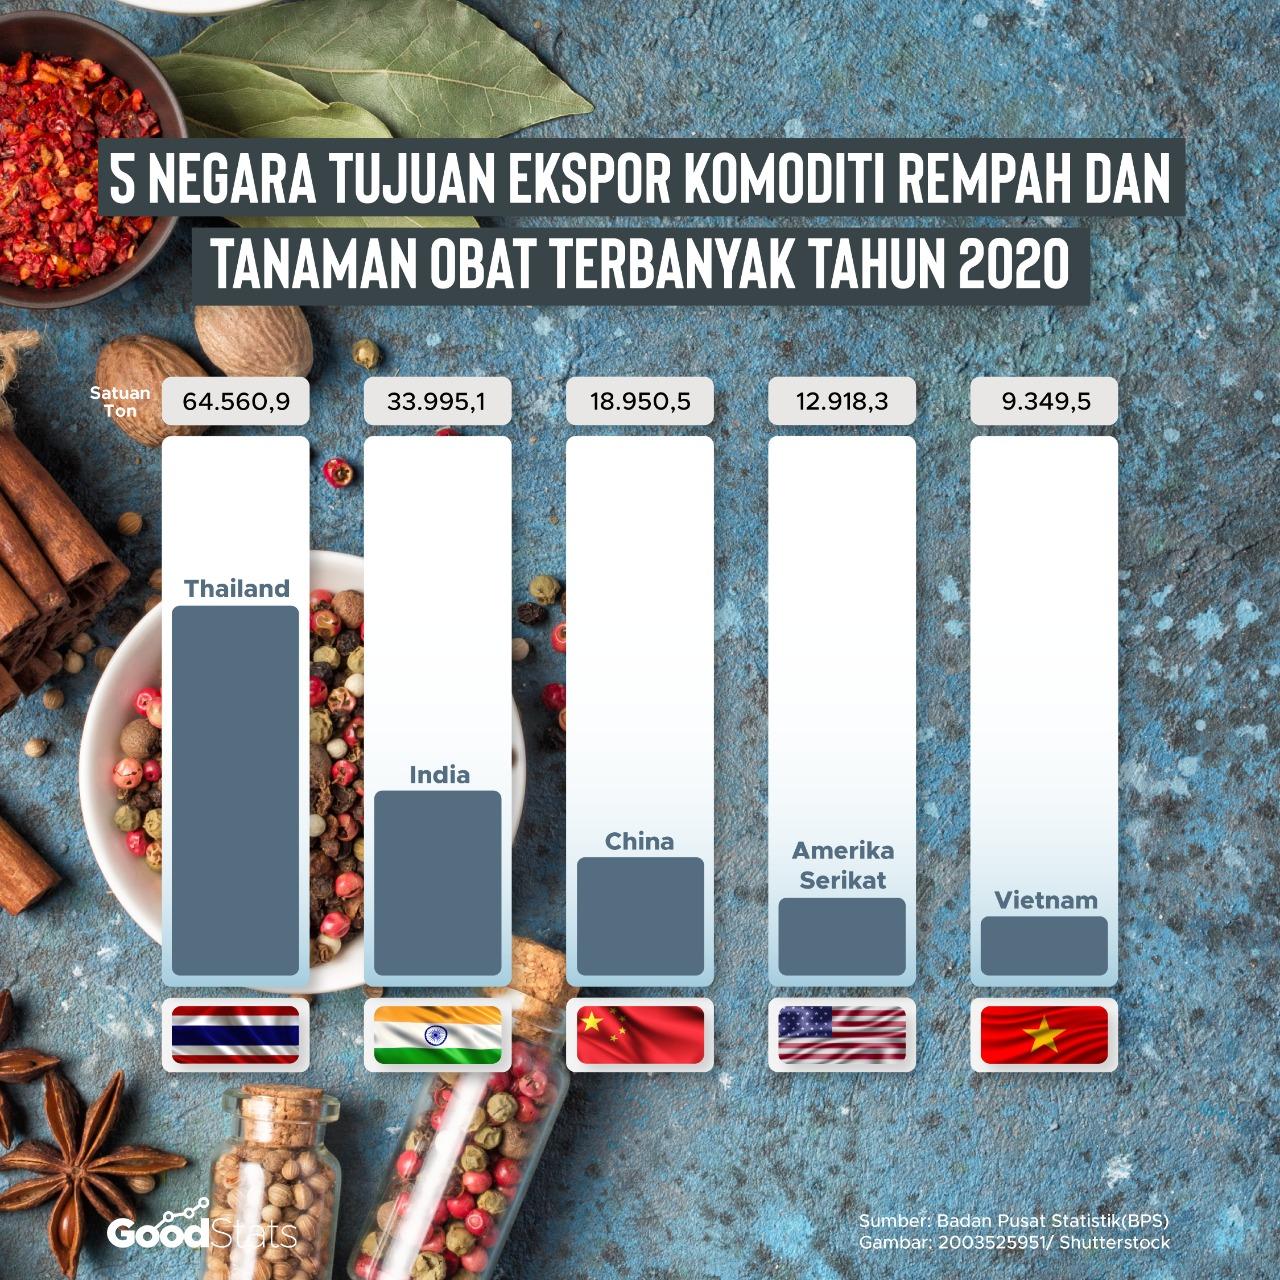 Negara tujuan ekspor komoditi rempah dan tanaman obat terbanyak tahun 2020 | GoodStats